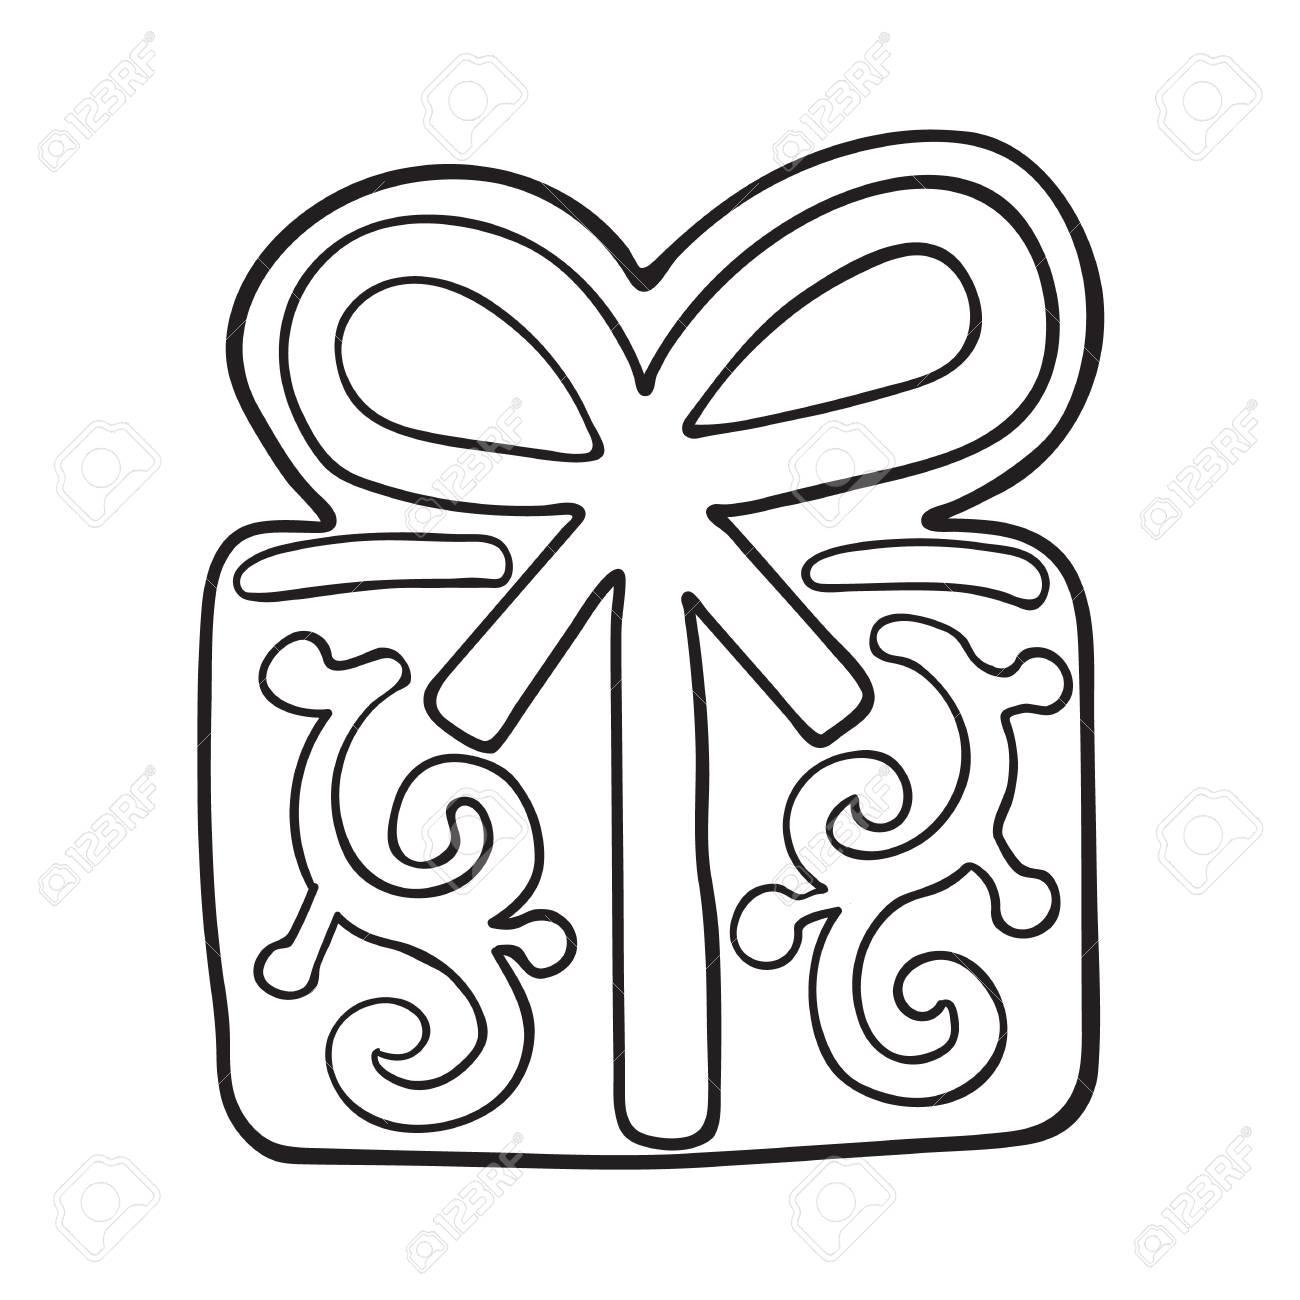 Glazed Present, Gift Box Shaped Homemade Christmas Gingerbread ...